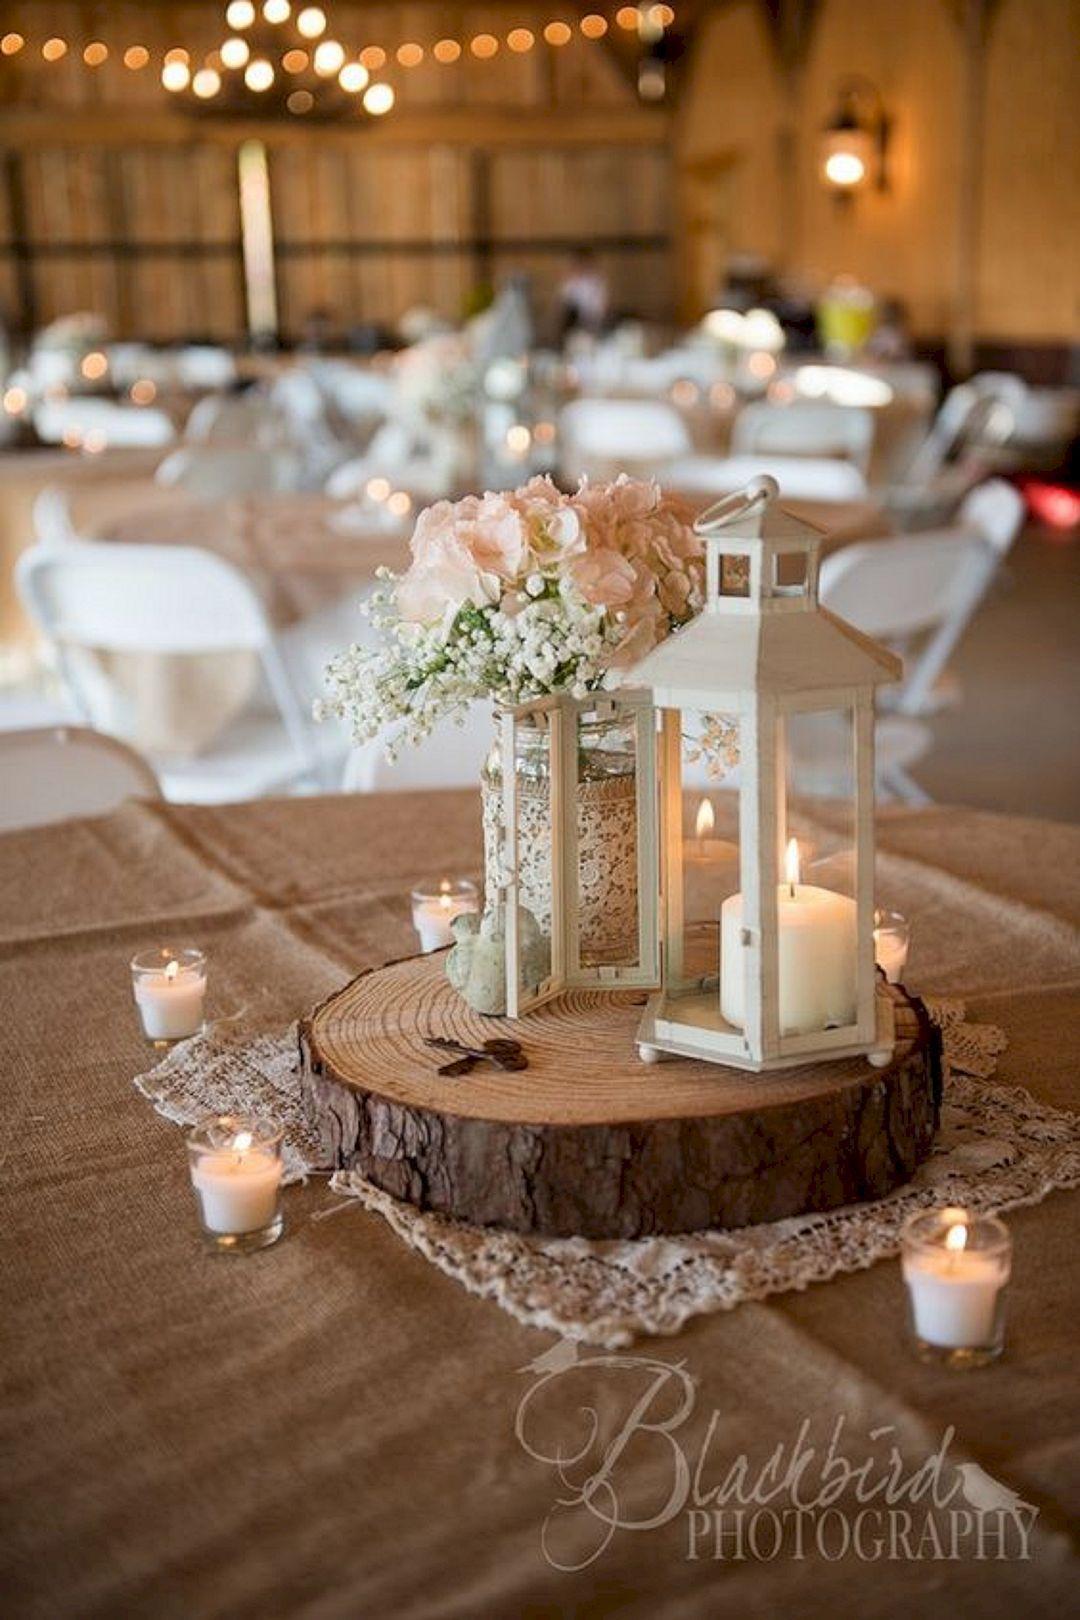 156 Diy Creative Rustic Chic Wedding Centerpieces Ideas Lantern